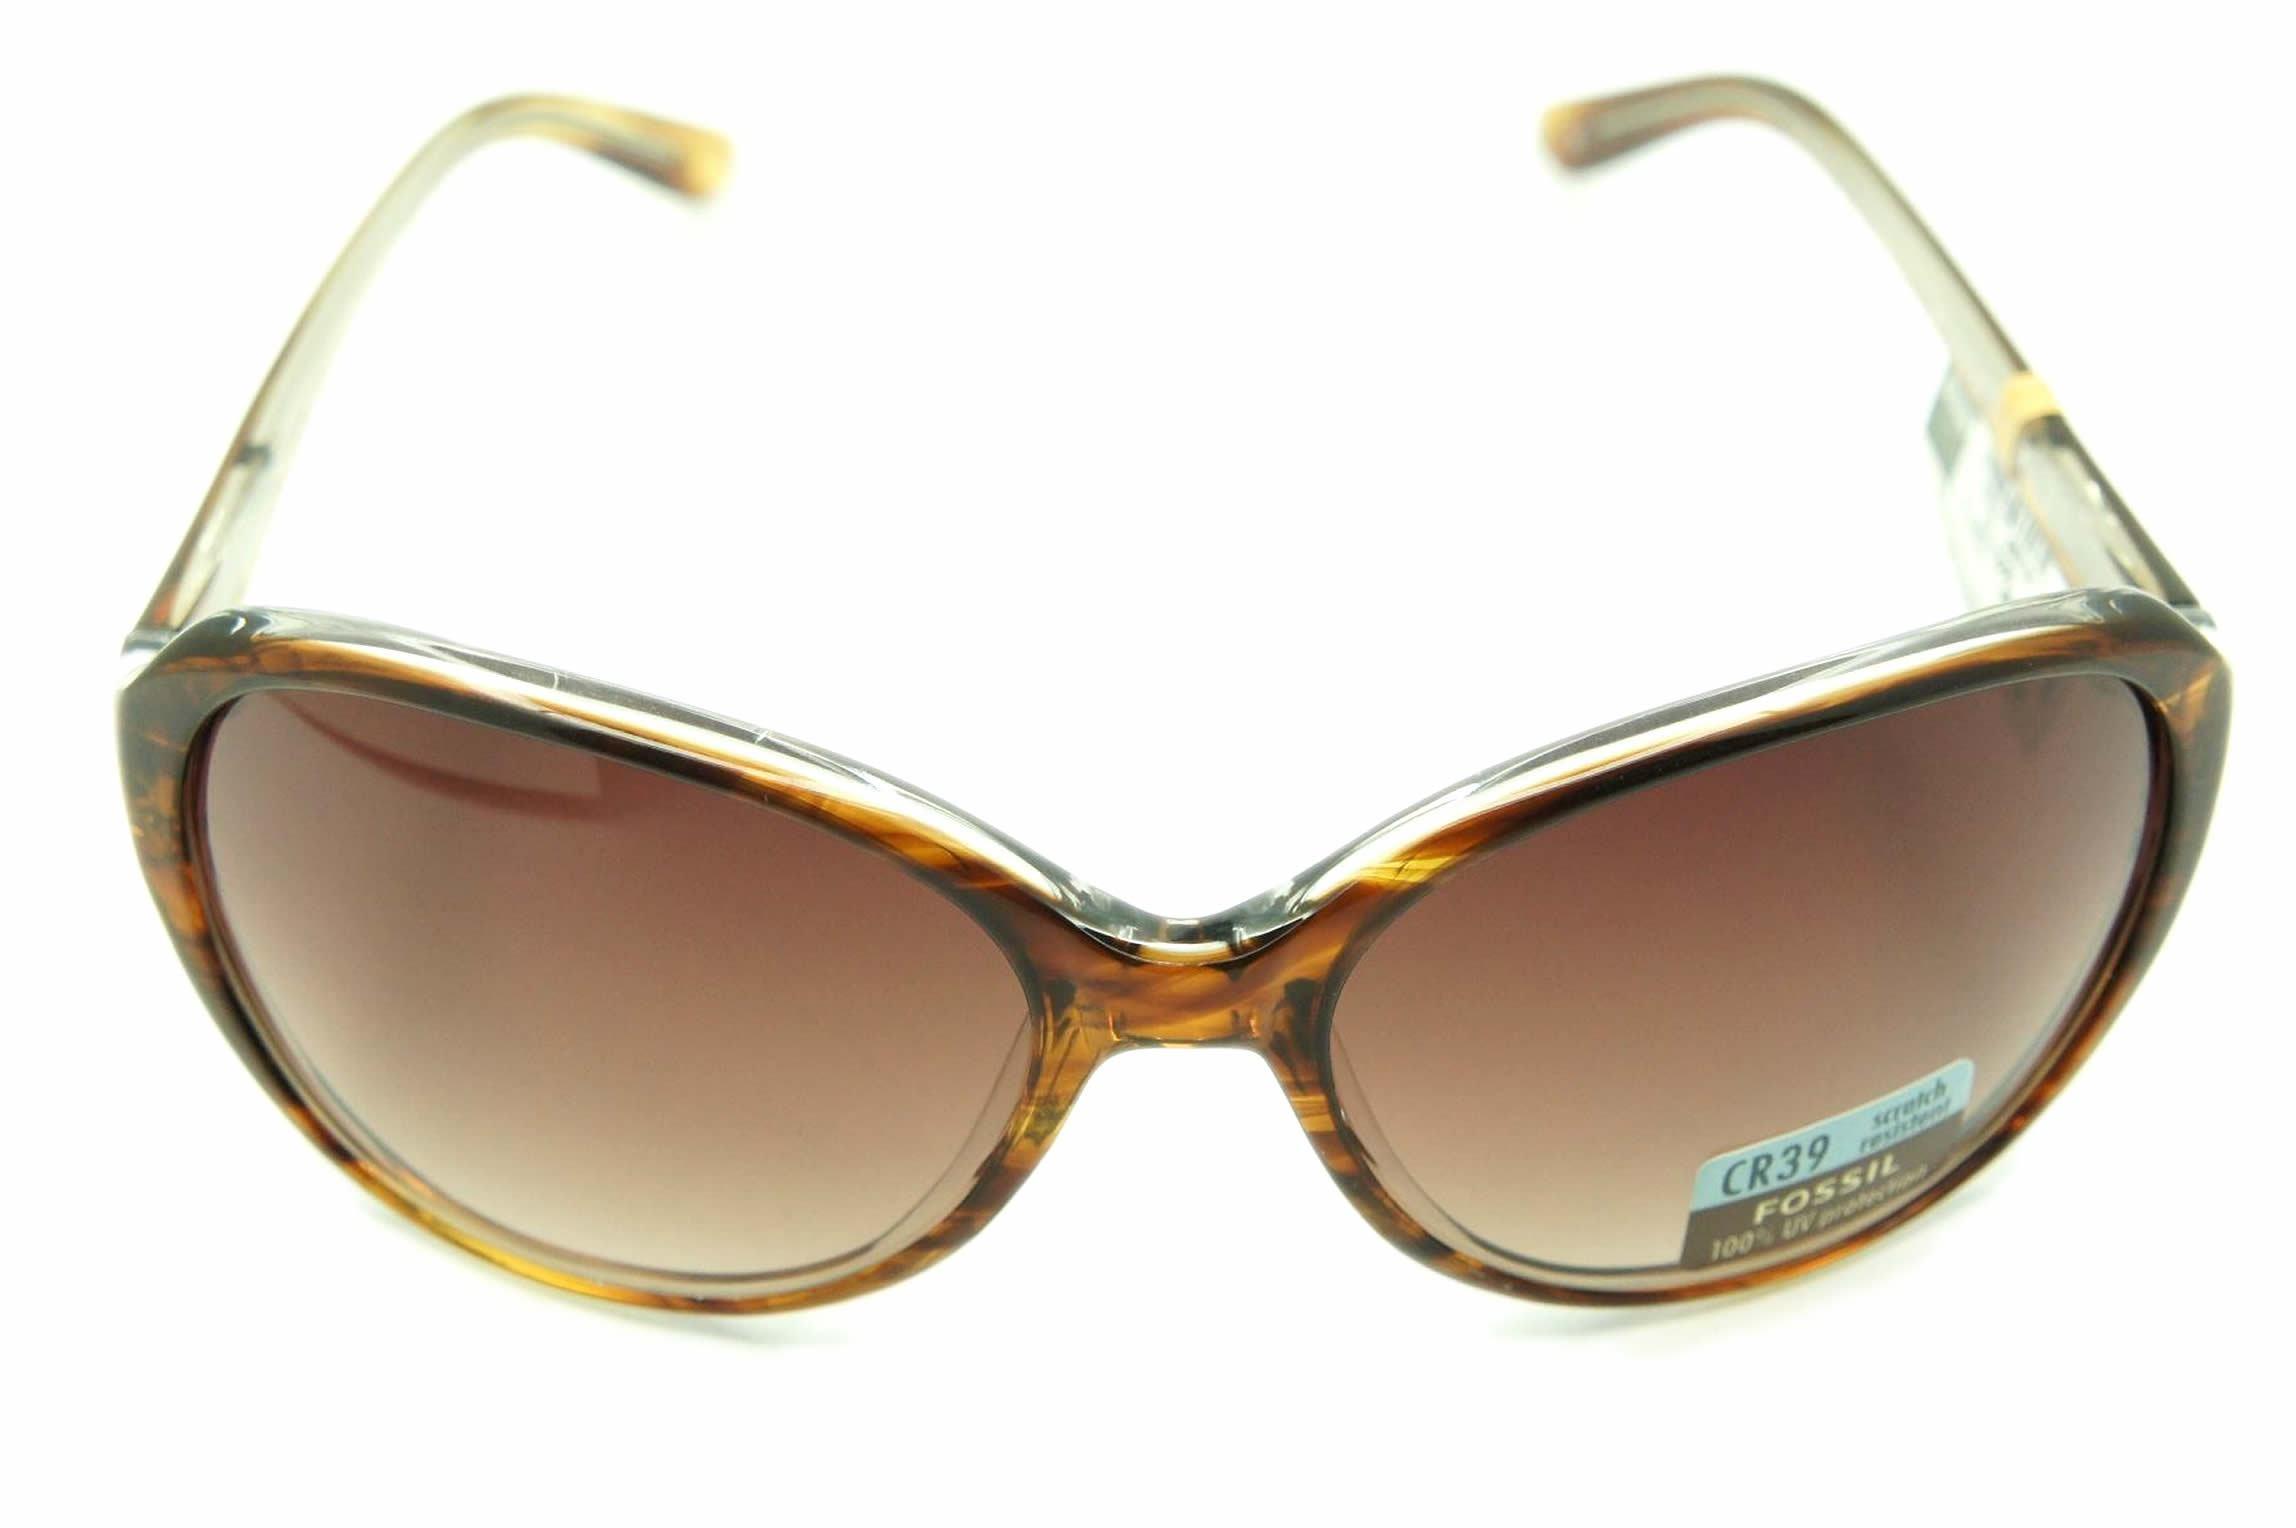 fossil damen sonnenbrille sunglasses st marys ps7172200. Black Bedroom Furniture Sets. Home Design Ideas